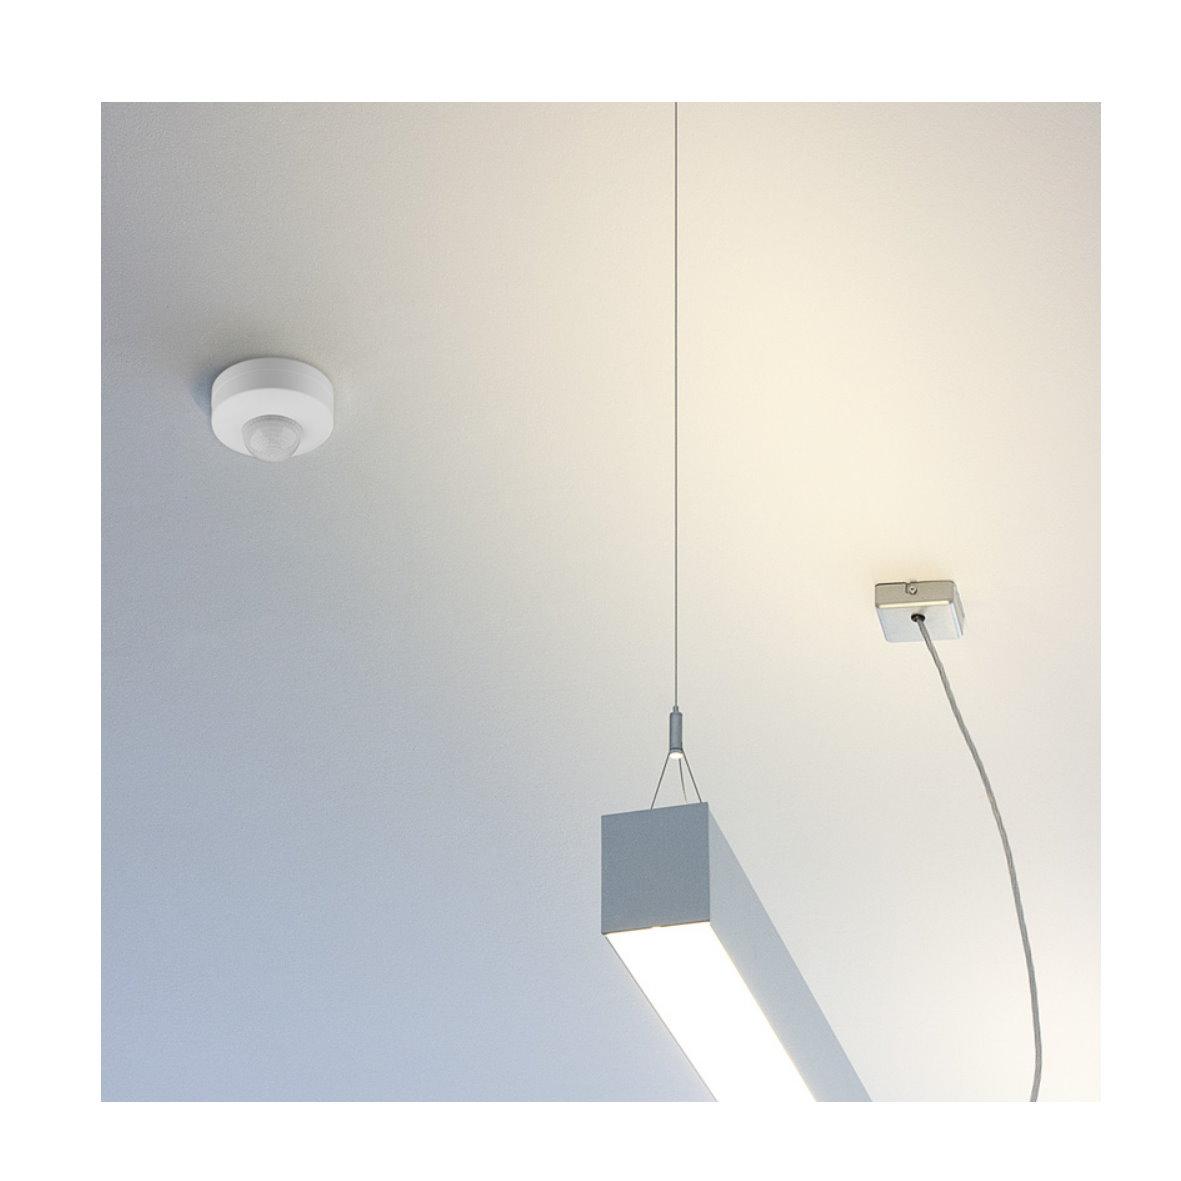 bewegungsmelder 360 sensor au en einbau led decke wand 230v unterputz spot wei ebay. Black Bedroom Furniture Sets. Home Design Ideas